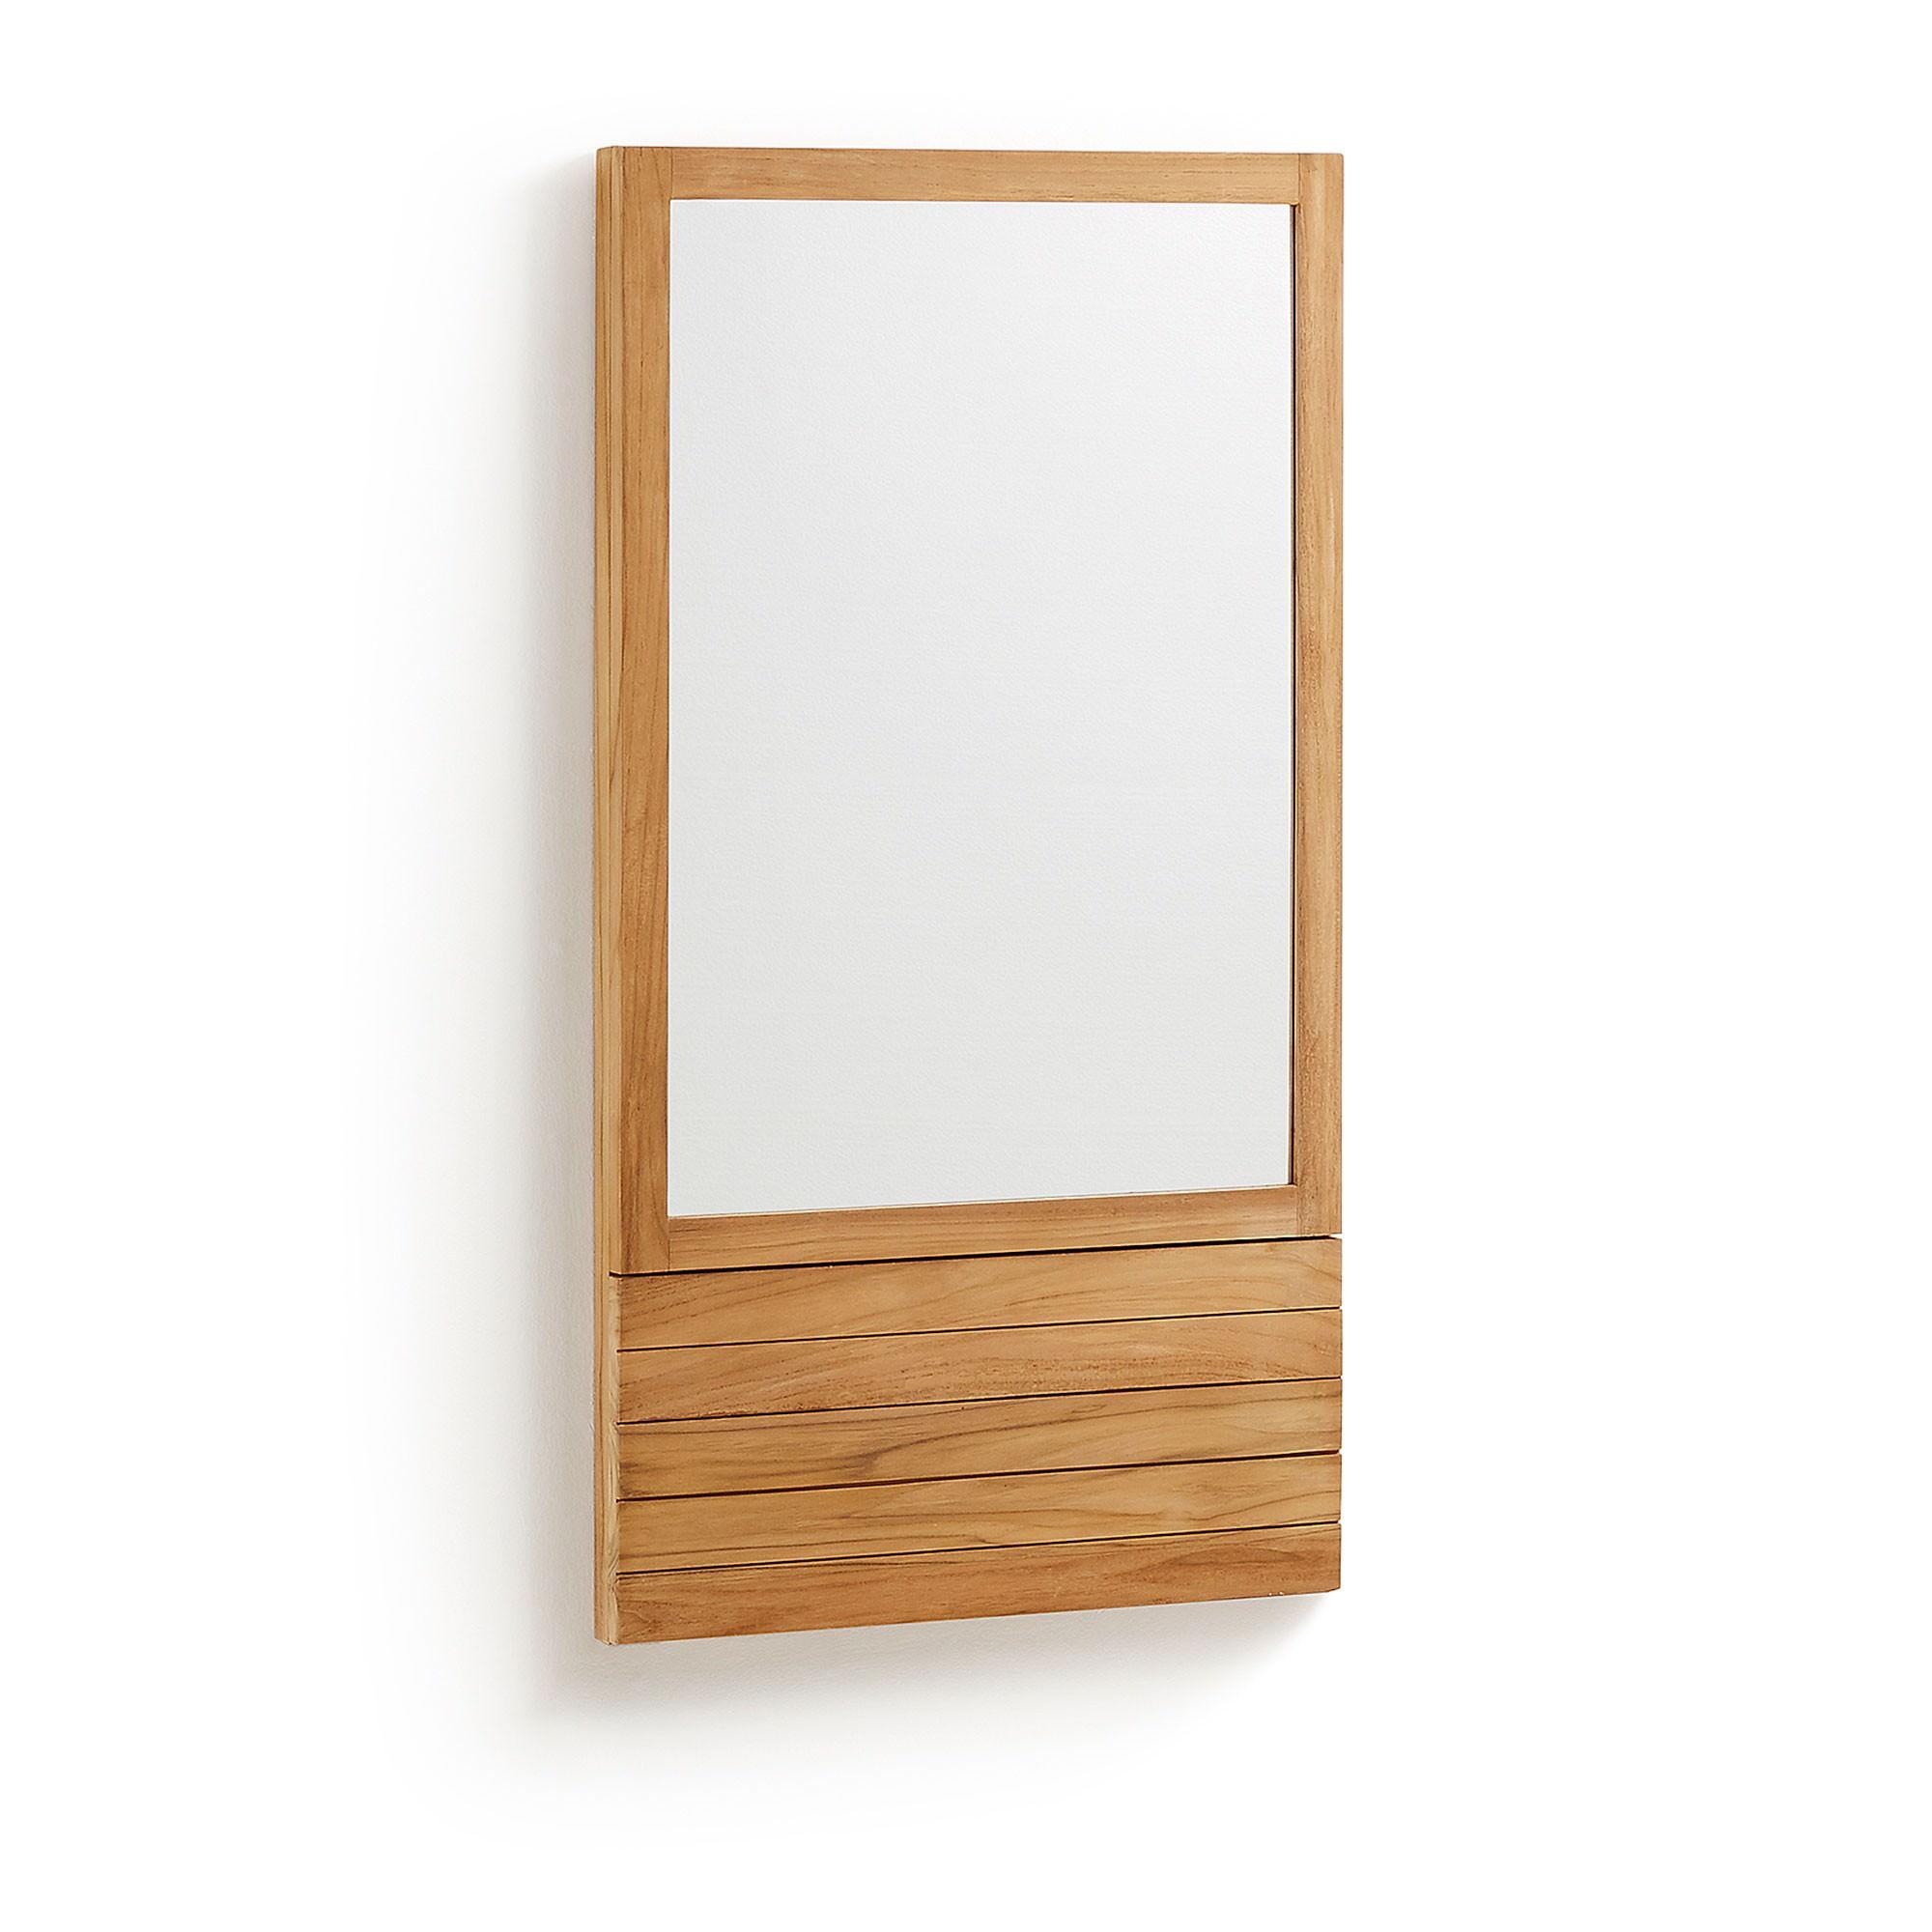 Ethel Teak Timber Bathroom Wall Mirror, 110cm